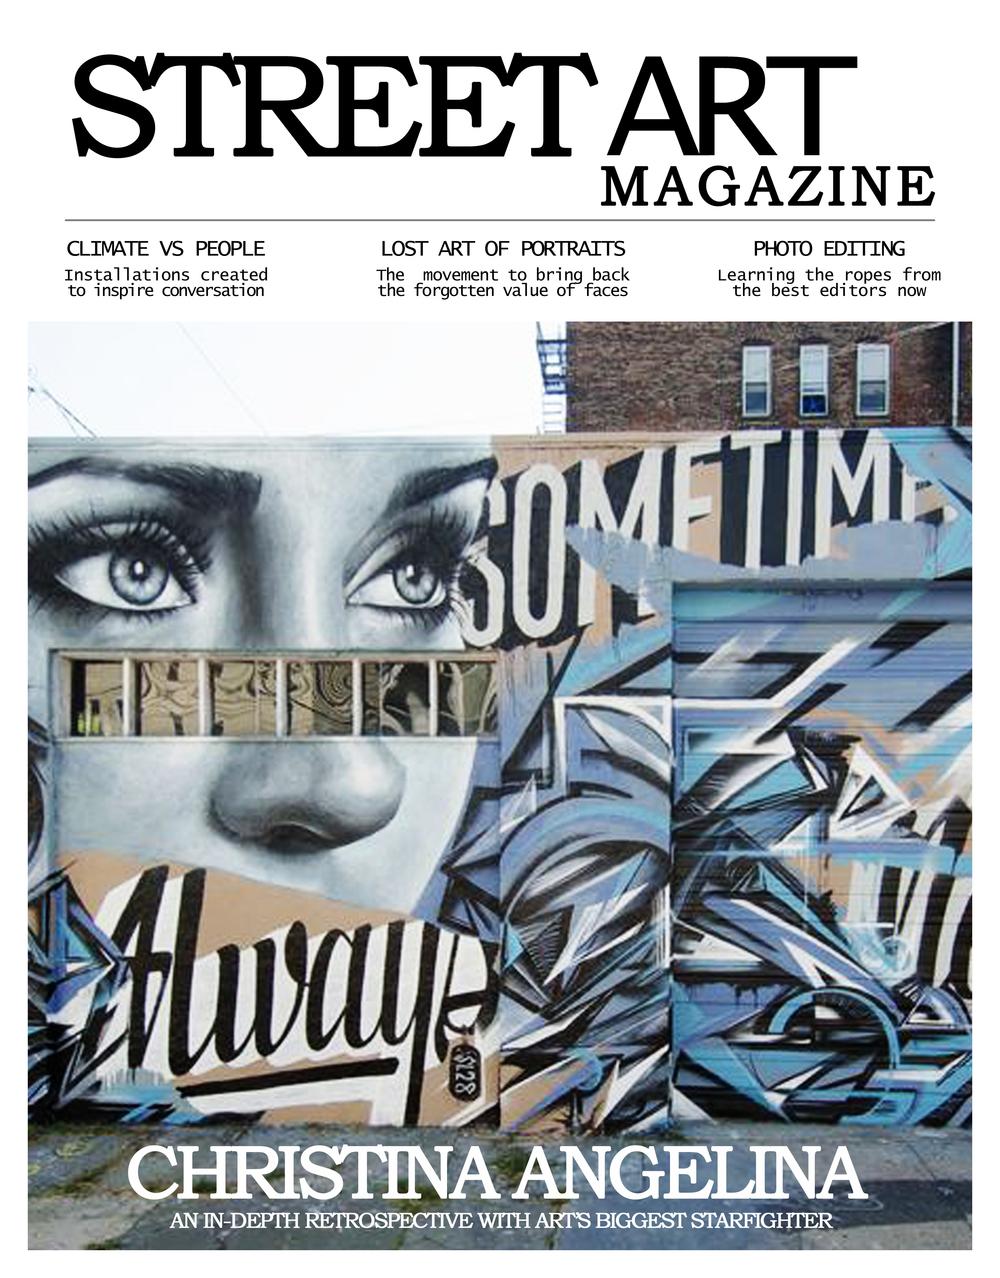 STREET ART MAG 01.jpg